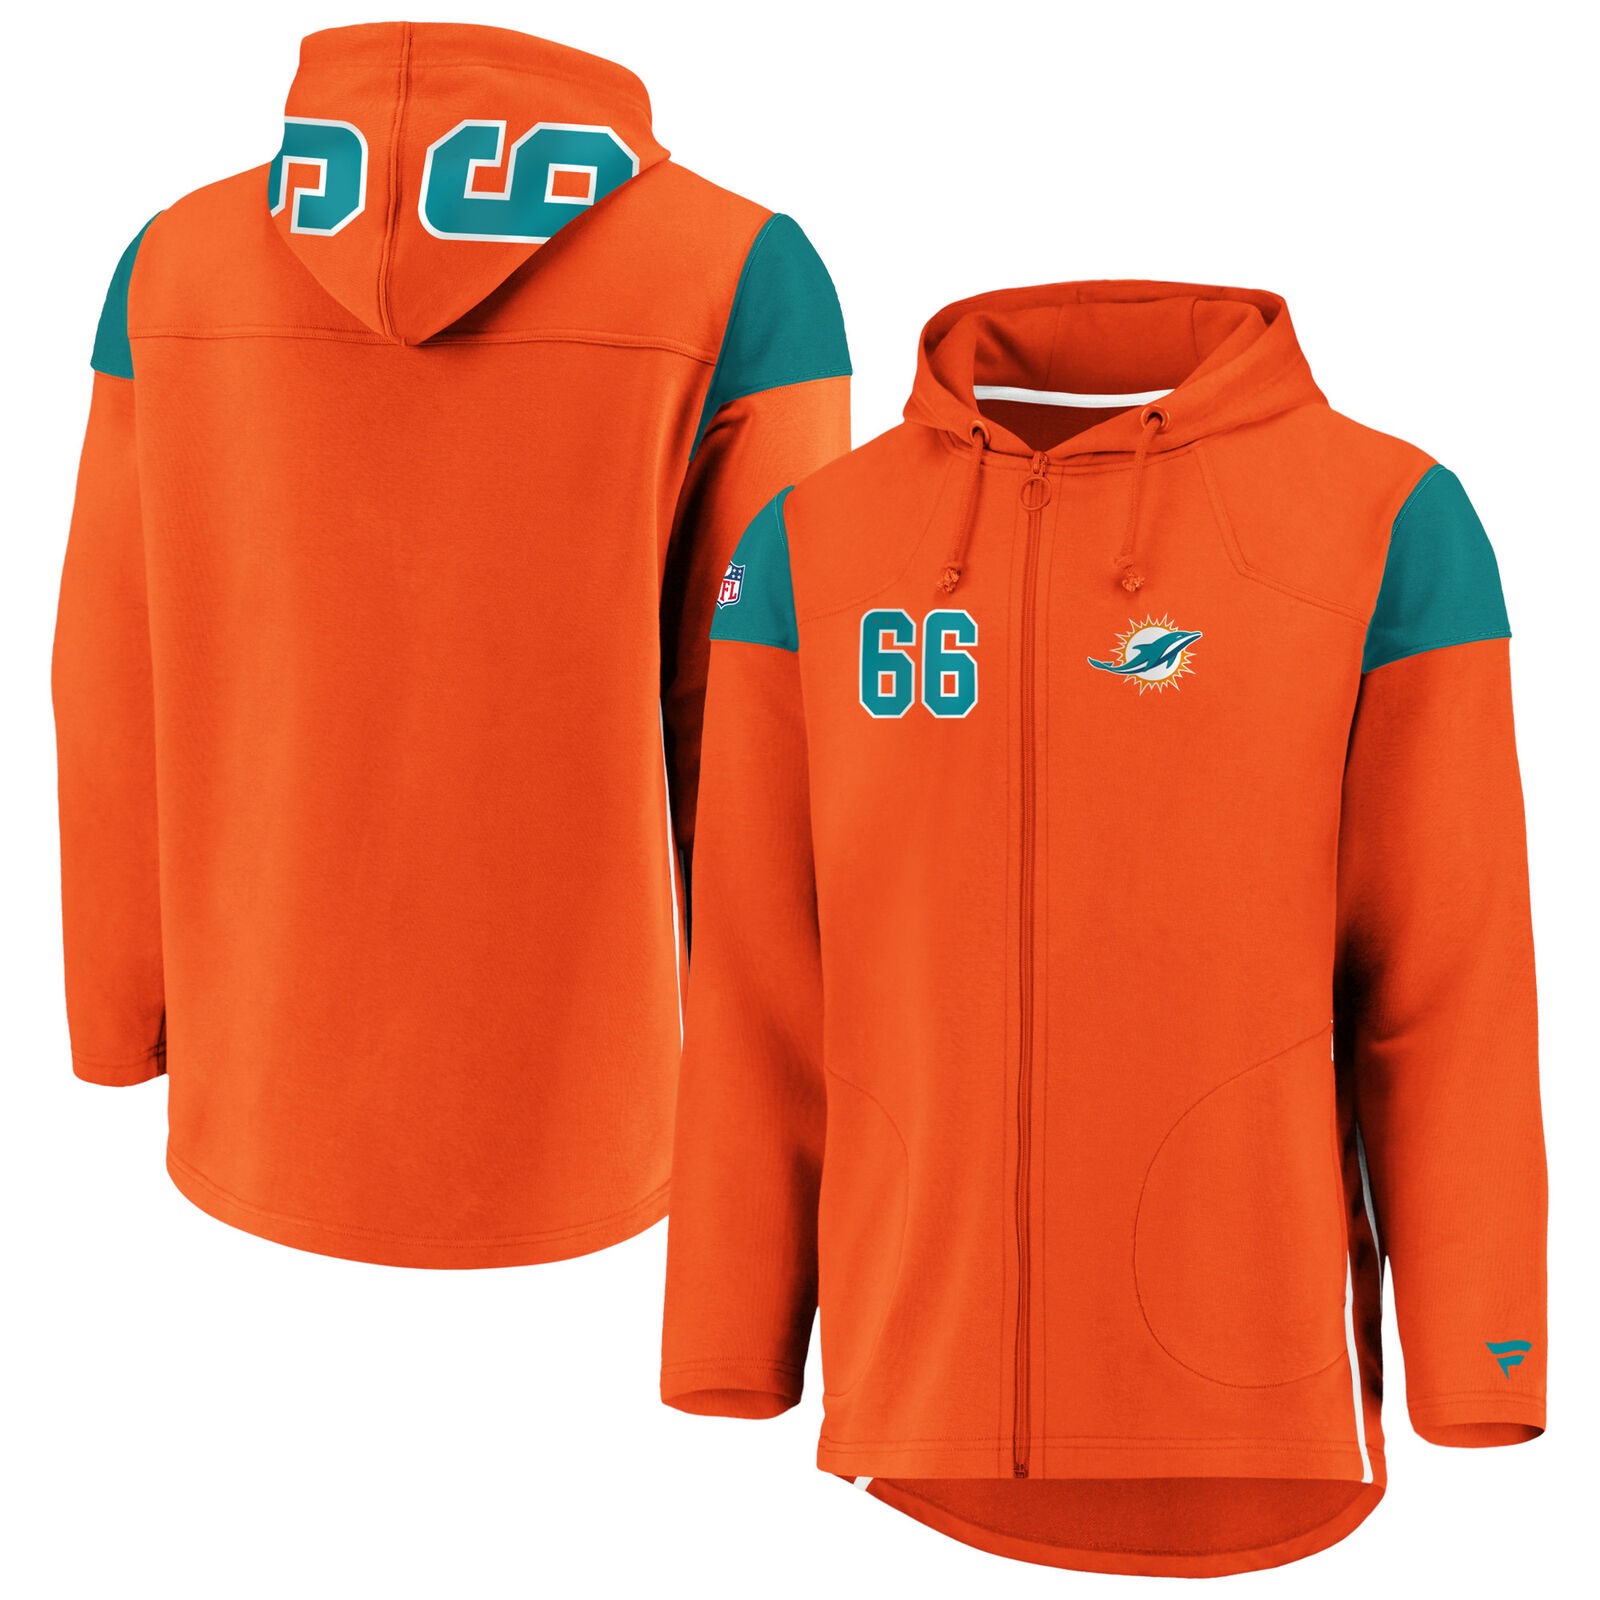 Miami Dolphins Franchise Full Zip Sport Sweater Hoodie Hoody - Mens